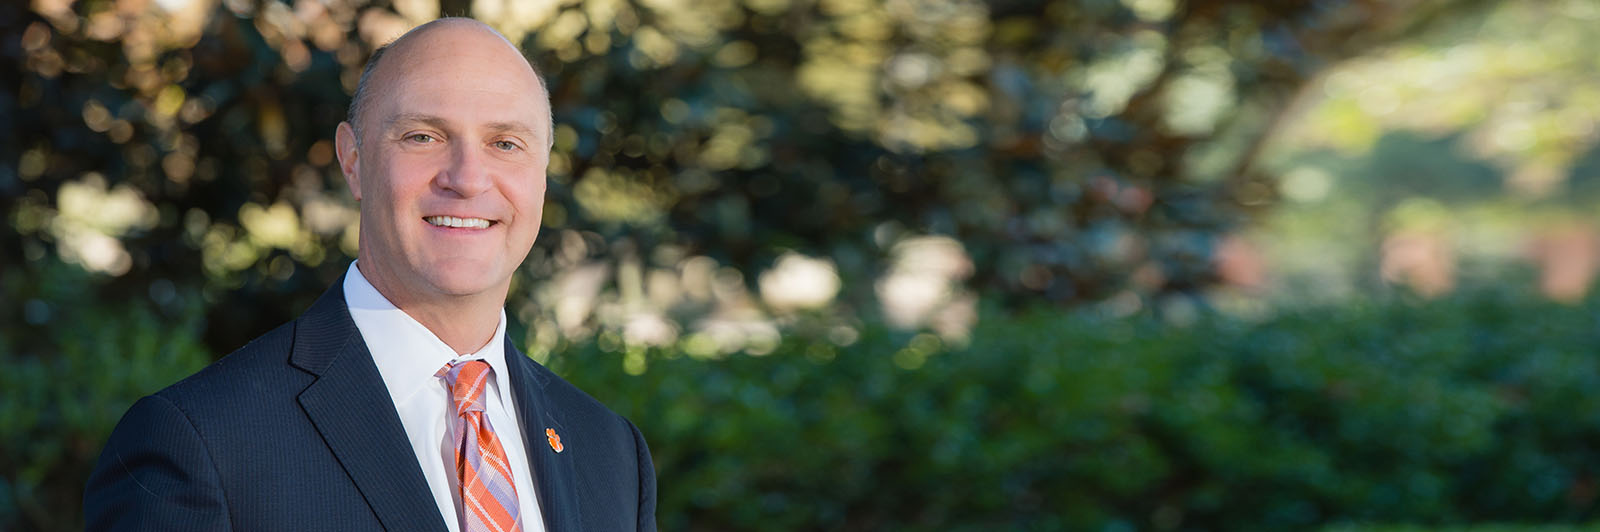 President Clements at Clemson University, South Carolina